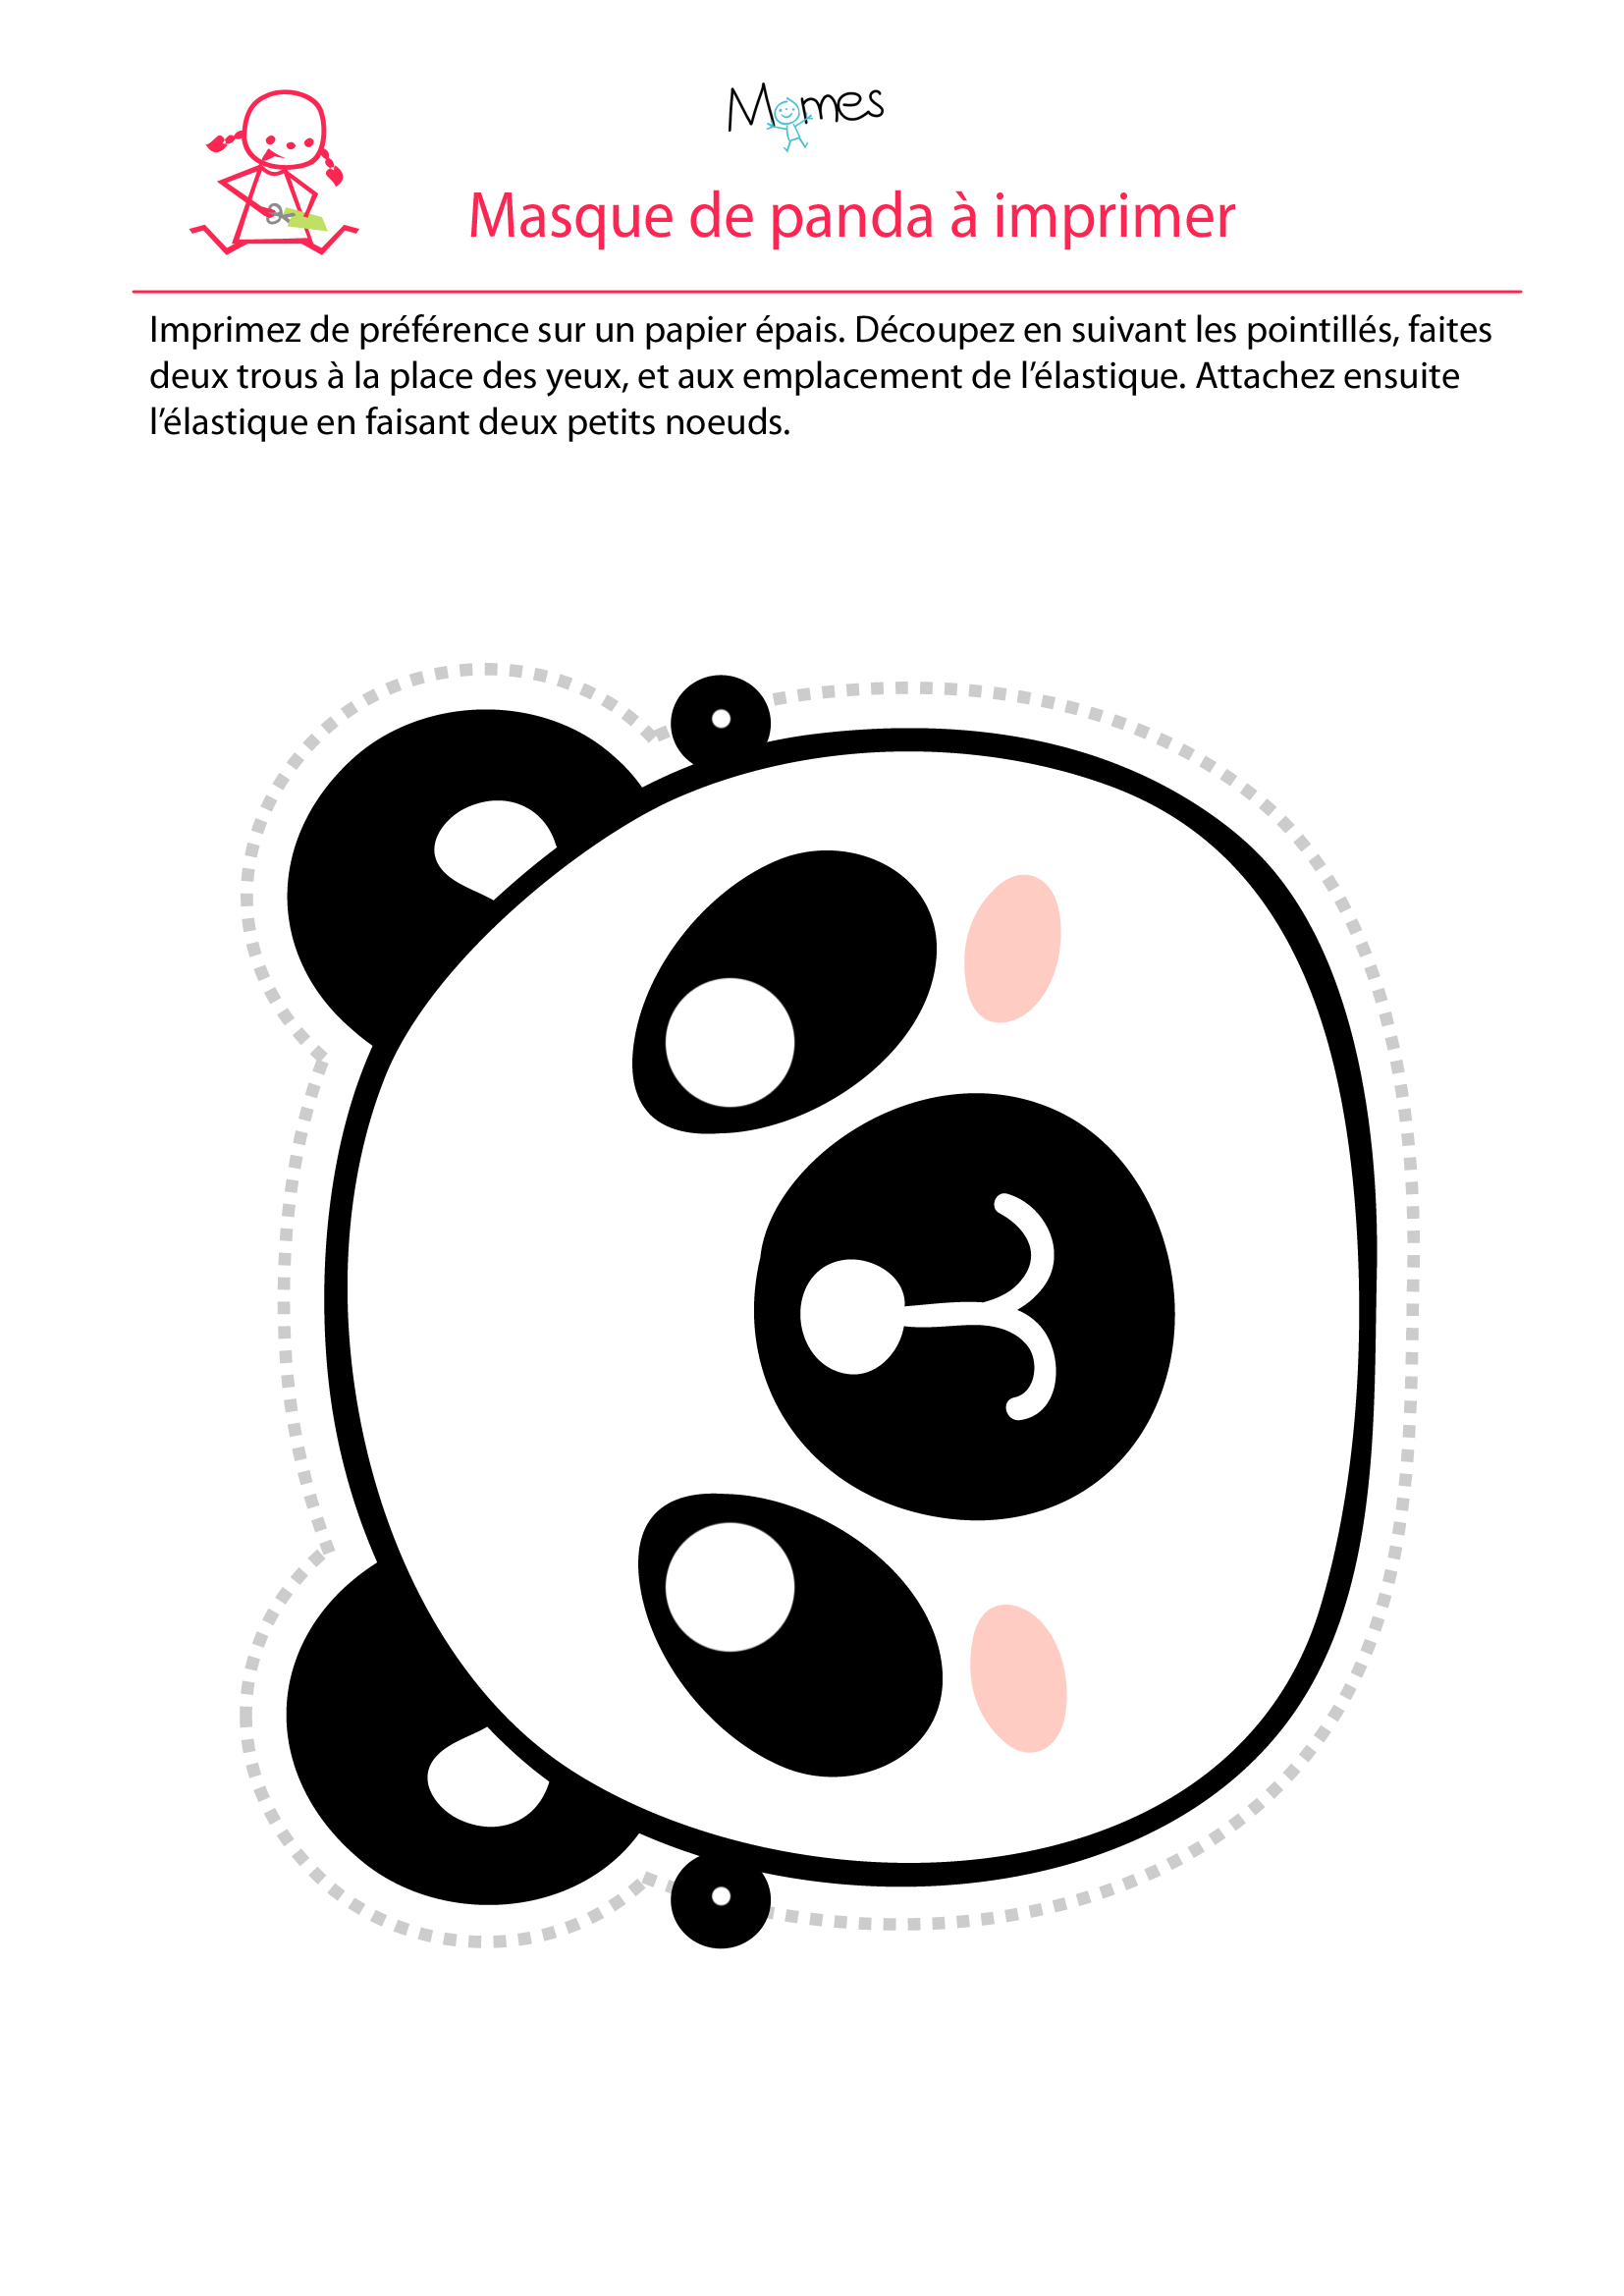 Masque de panda - Image de panda a imprimer ...